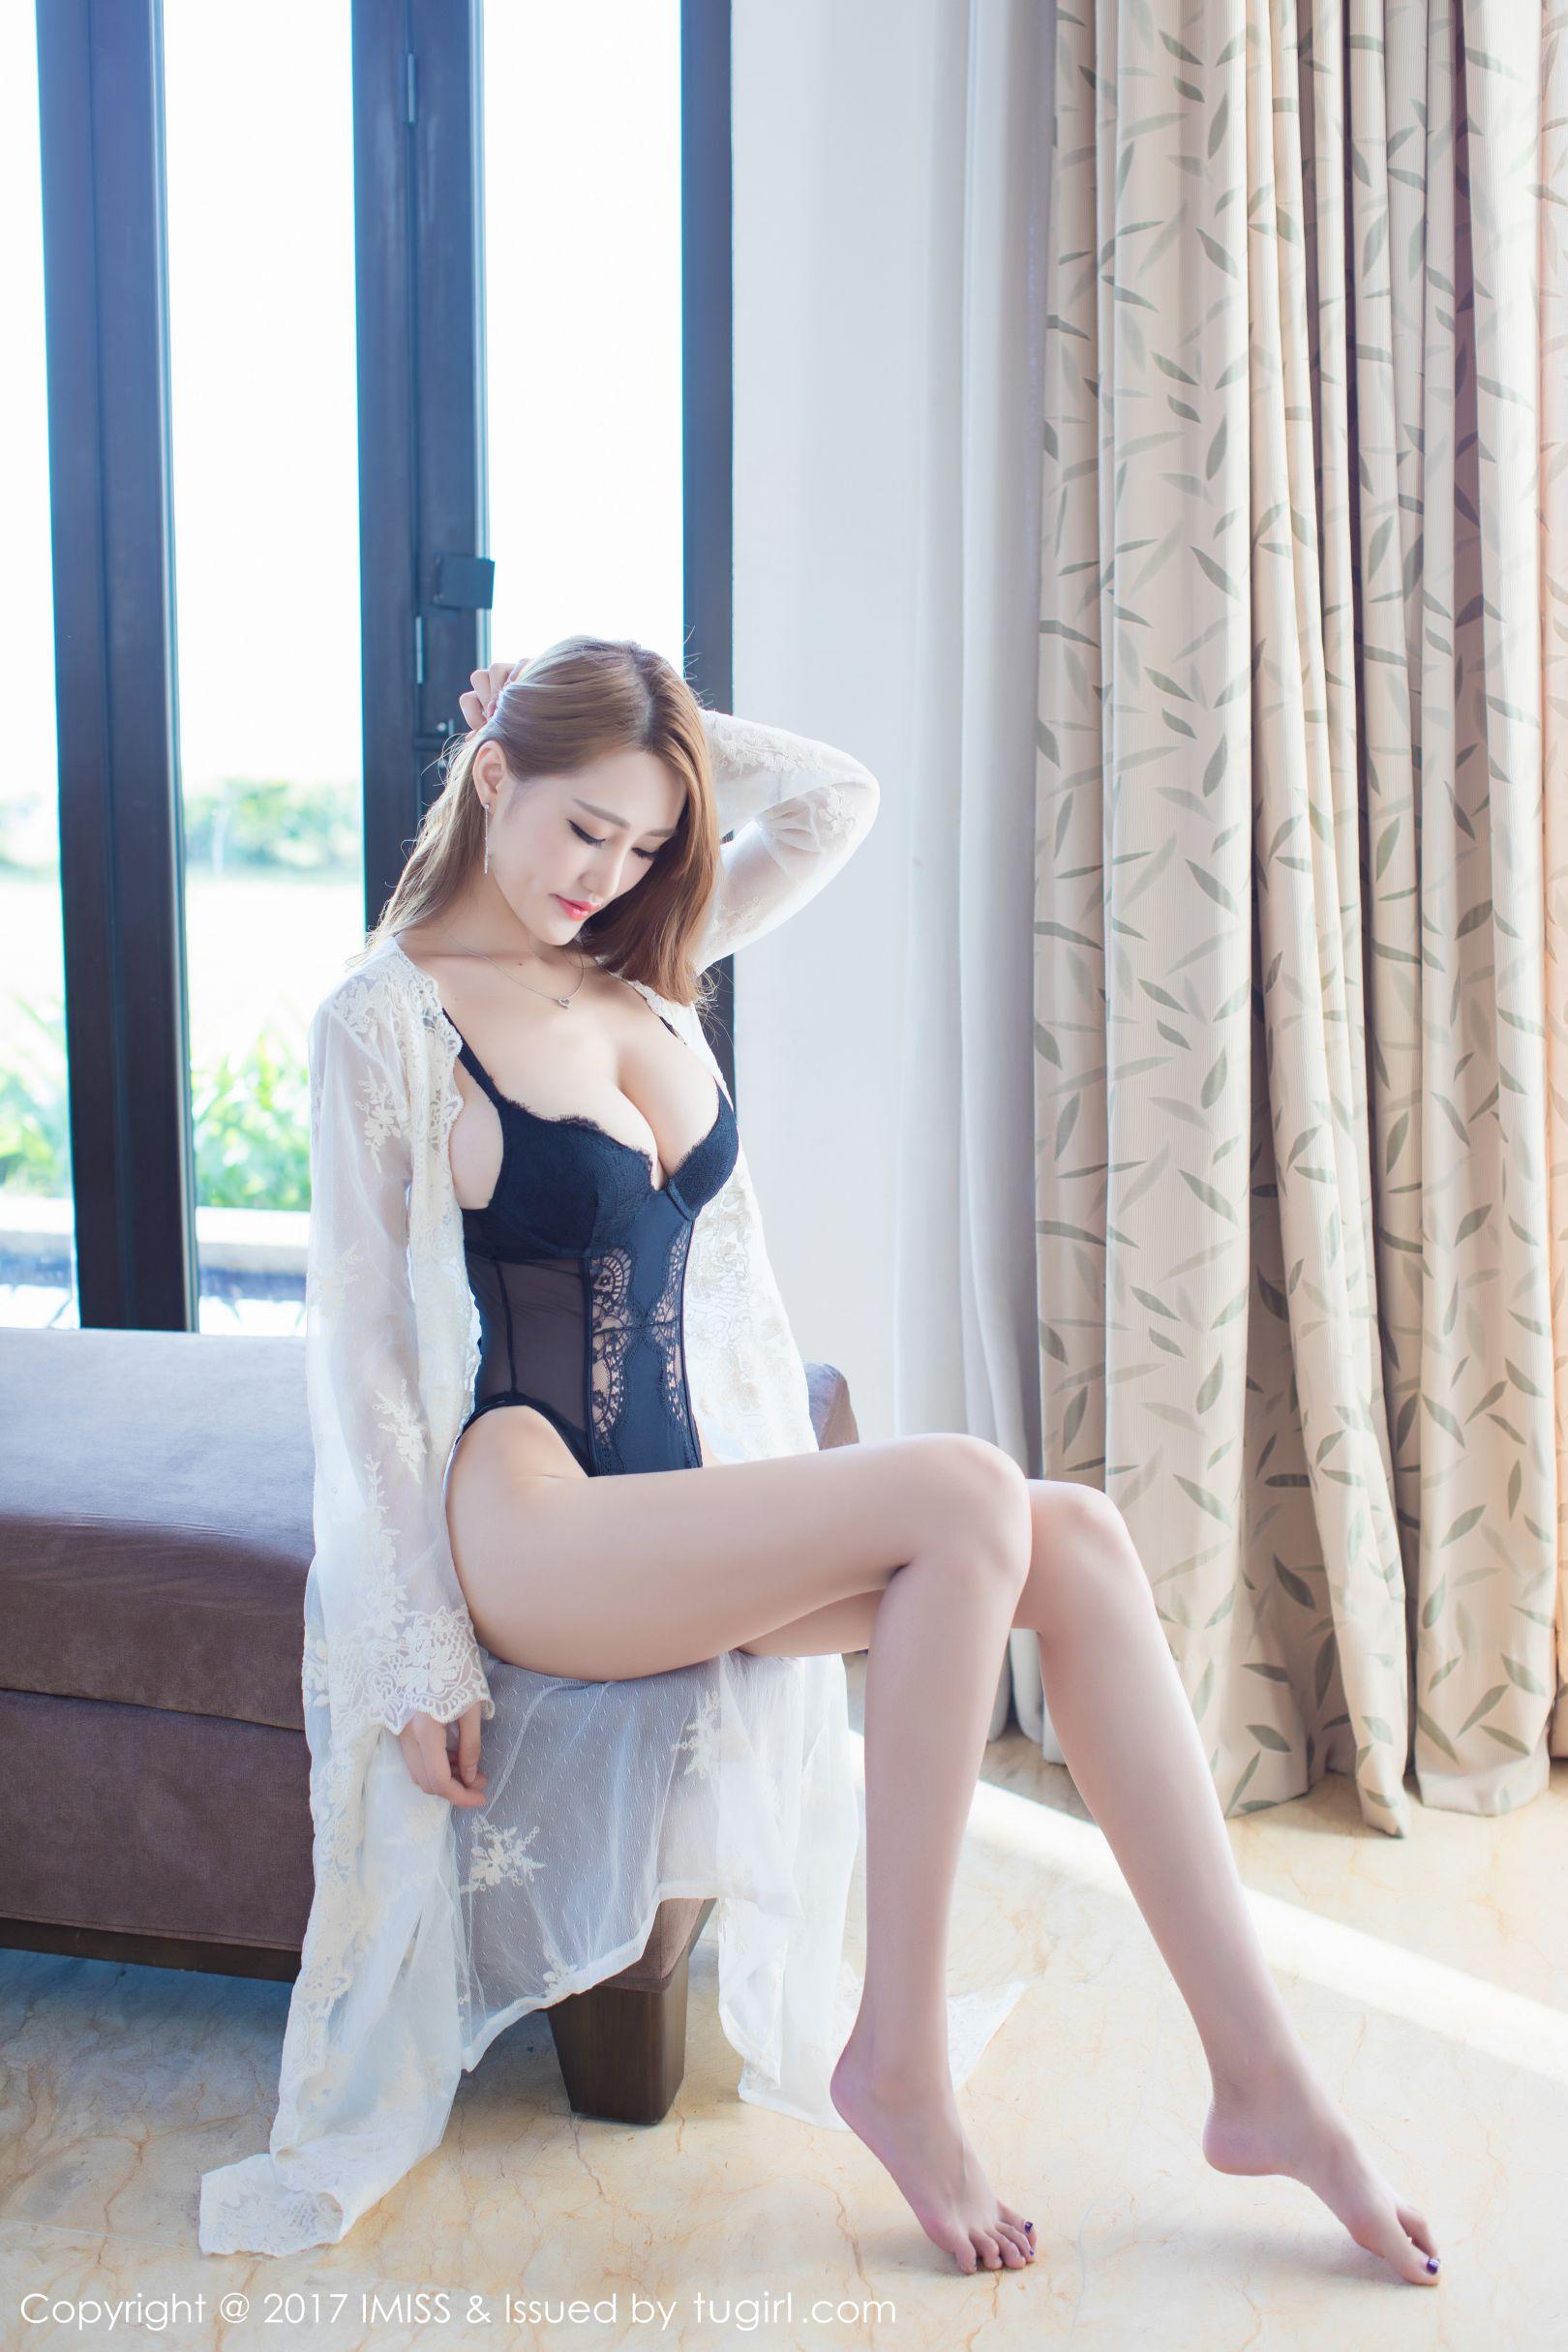 [IMiss 爱 蜜 社] Vol.168 Temperament Beauty @ 妤 薇 Vivian 沙巴 旅 Take the third set of photos